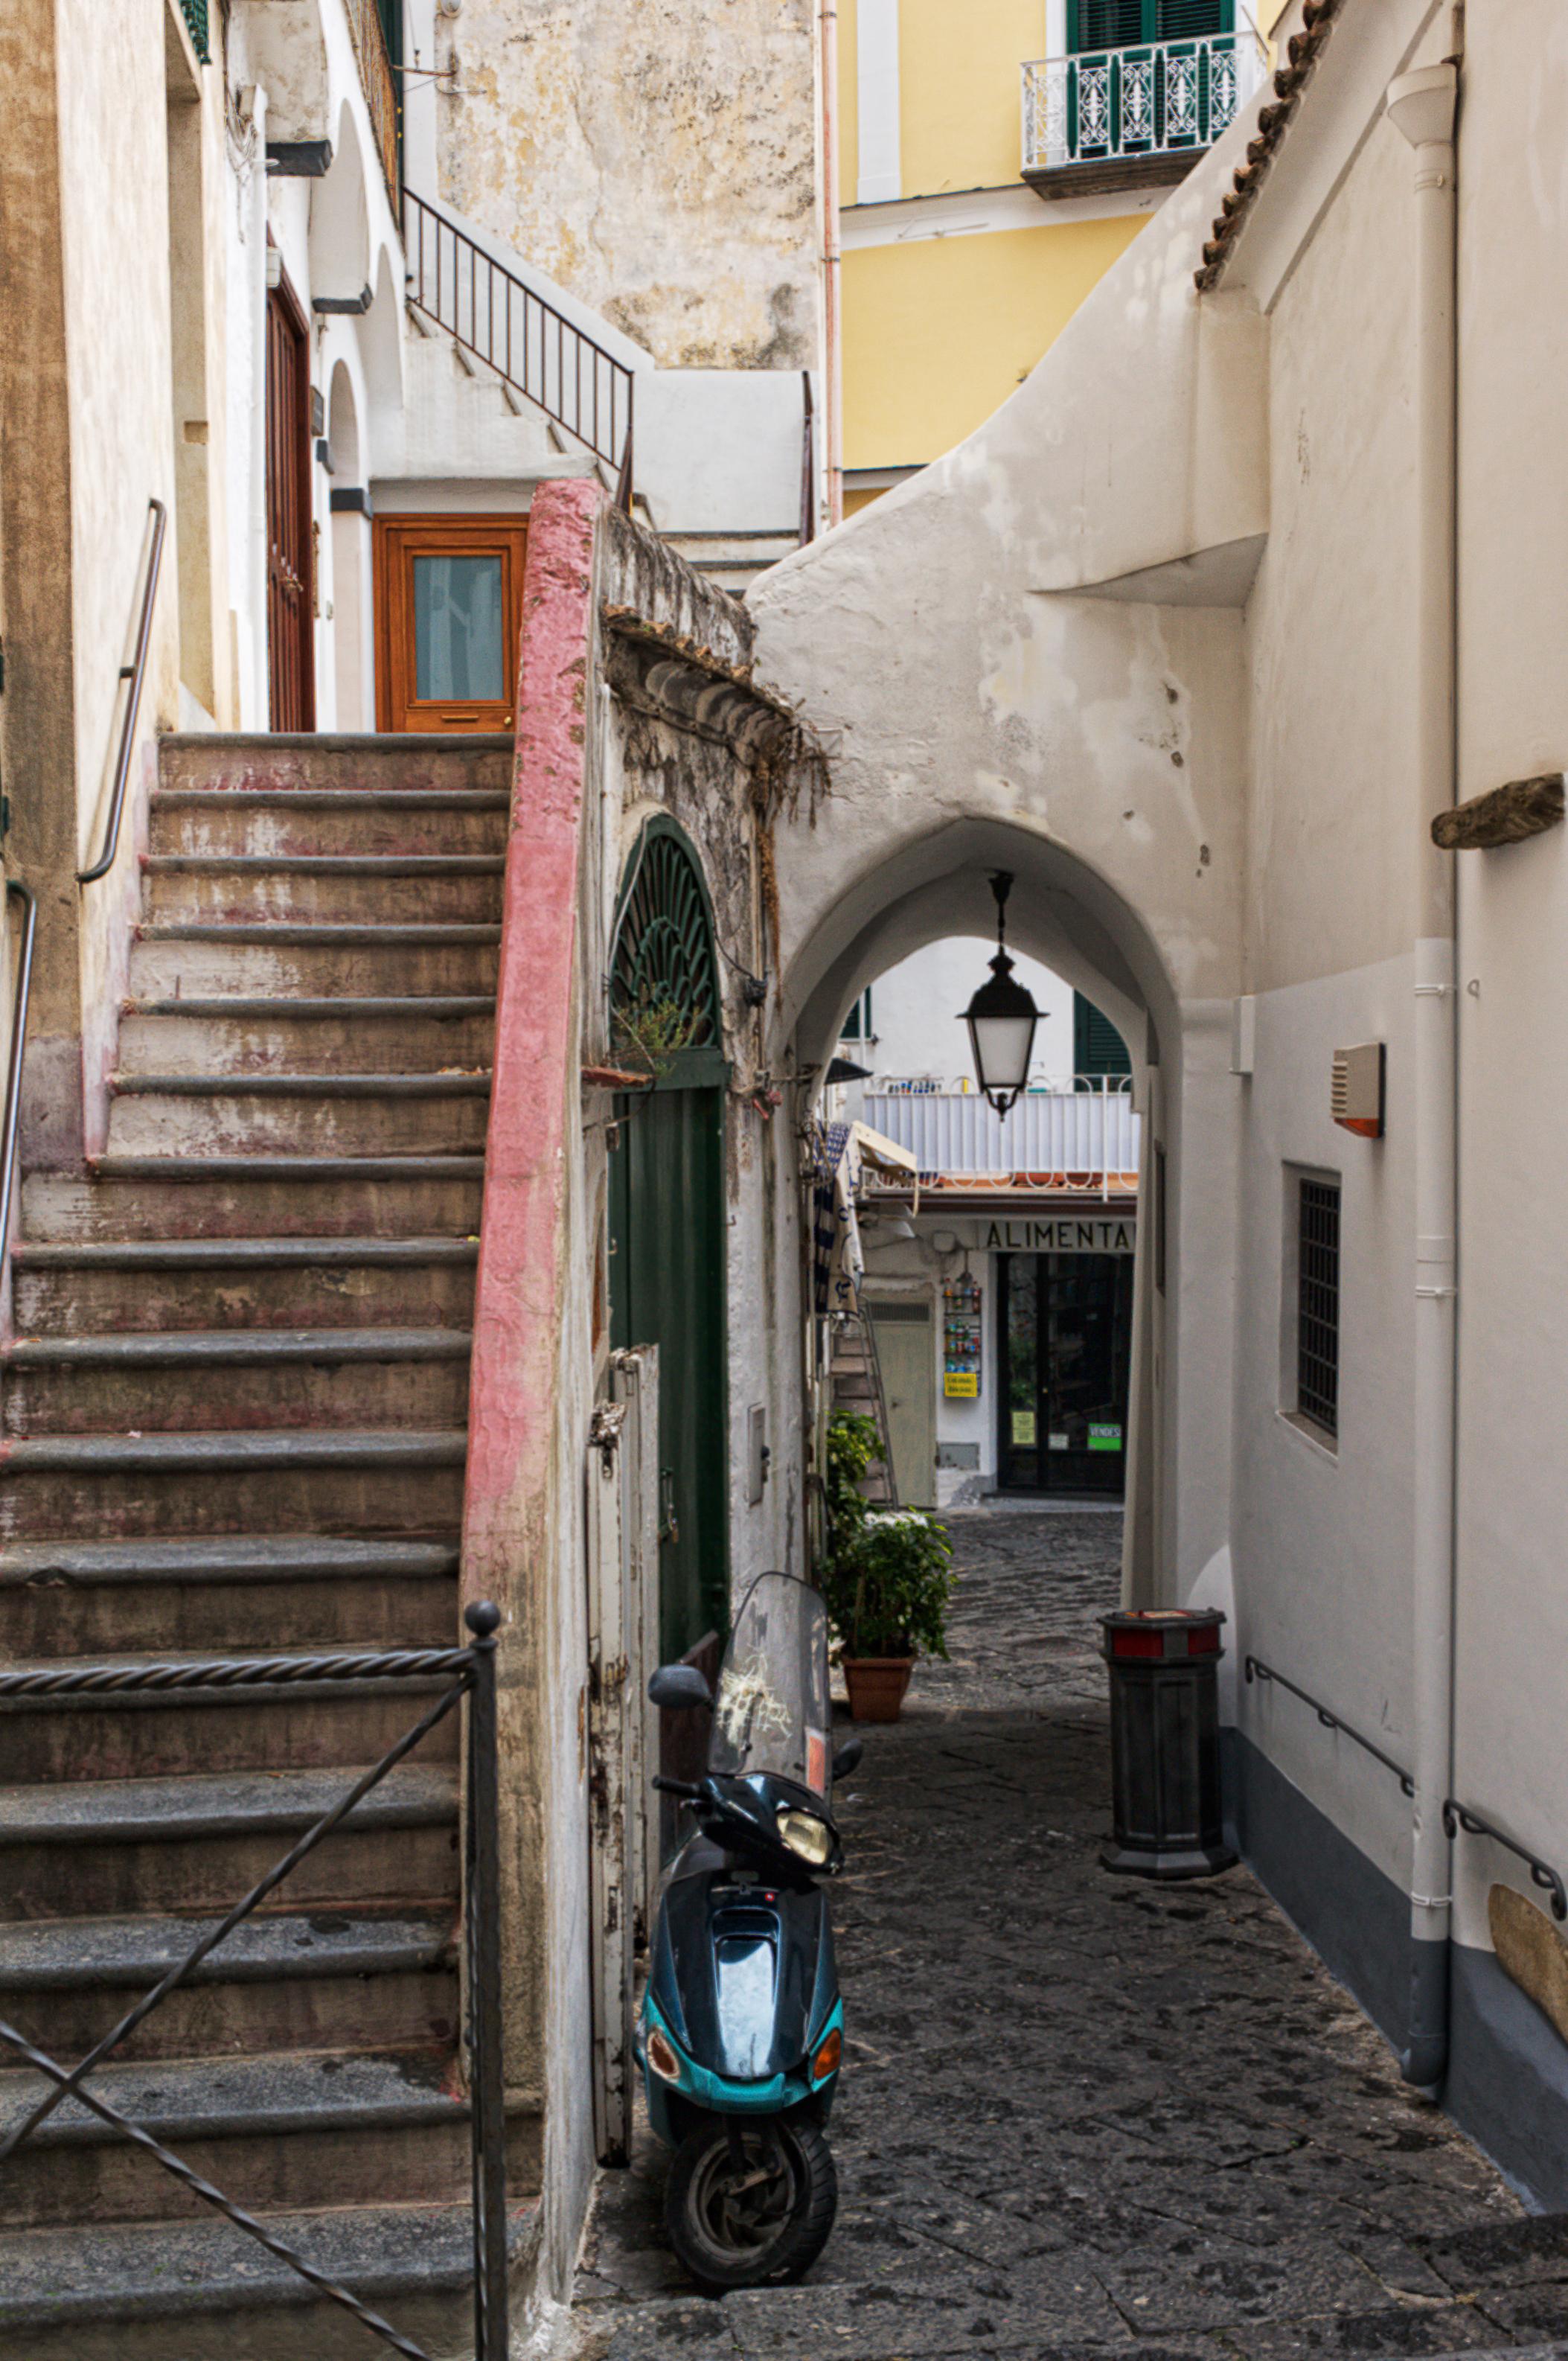 Italy-John Bardell-0920a.jpg